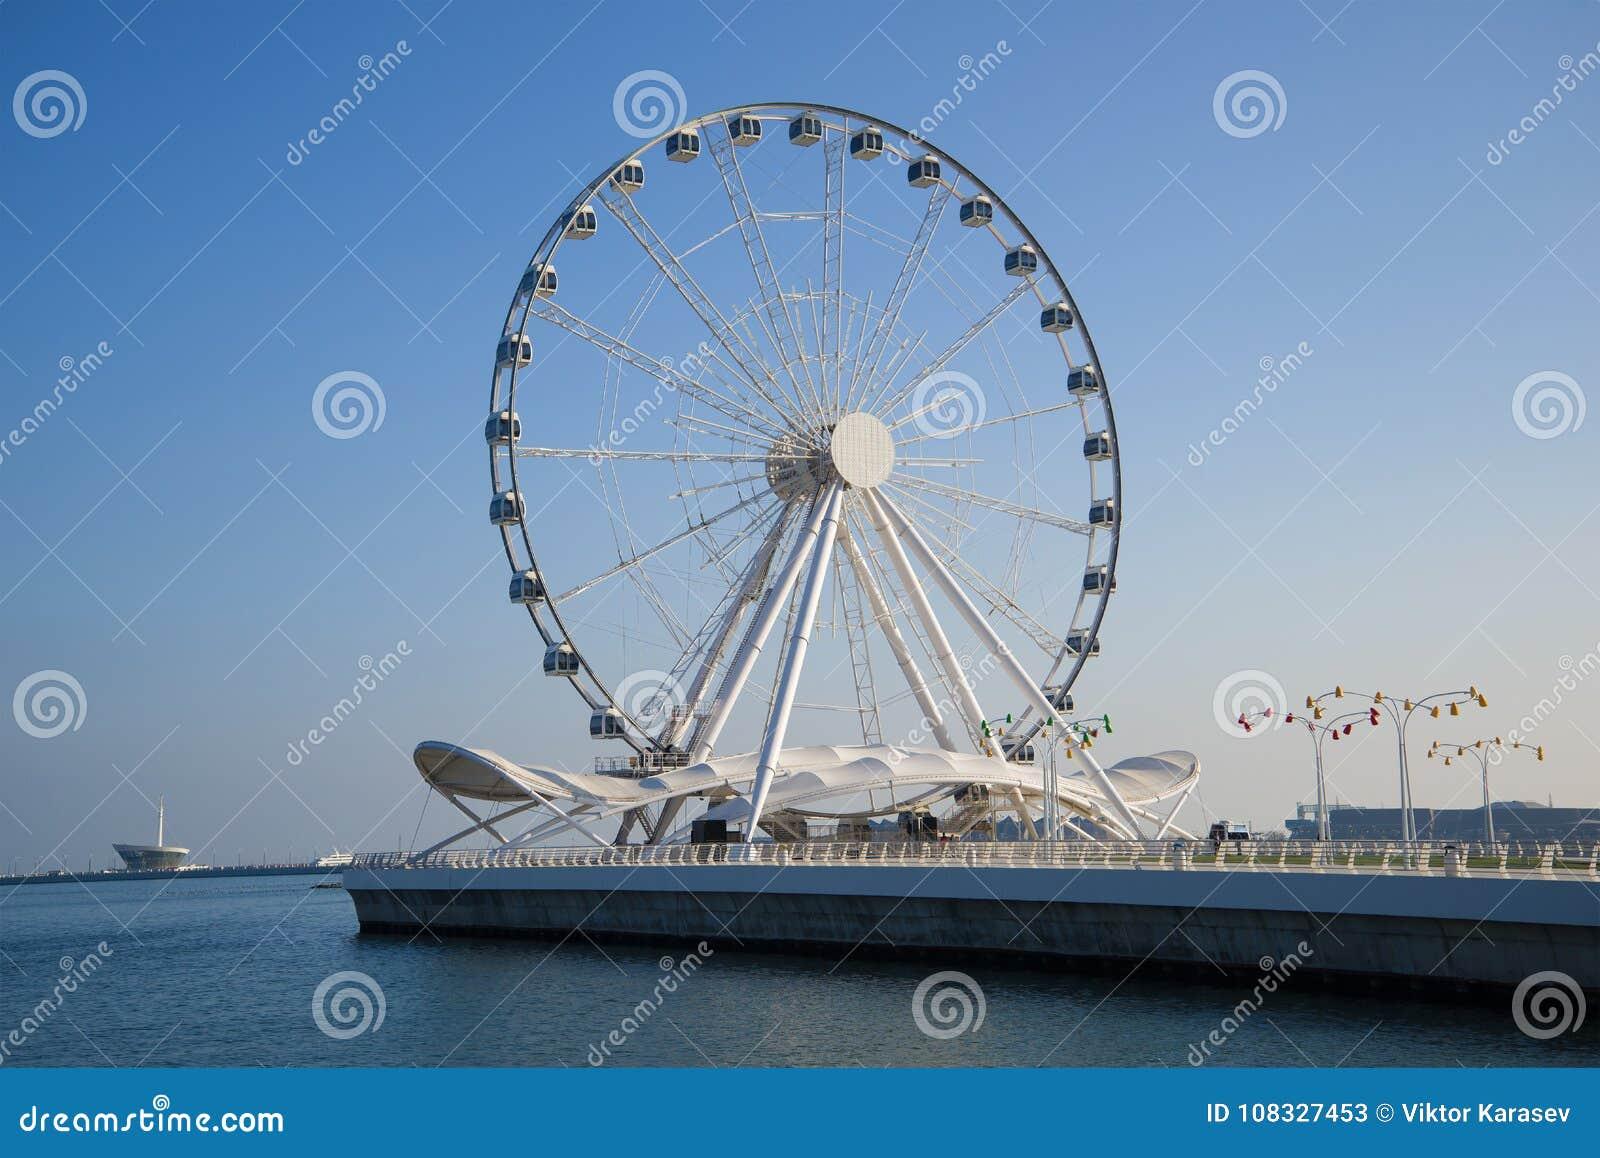 Big wheel on the embankment of the Caspian Sea in the sunny day. Baku, Azerbaijan